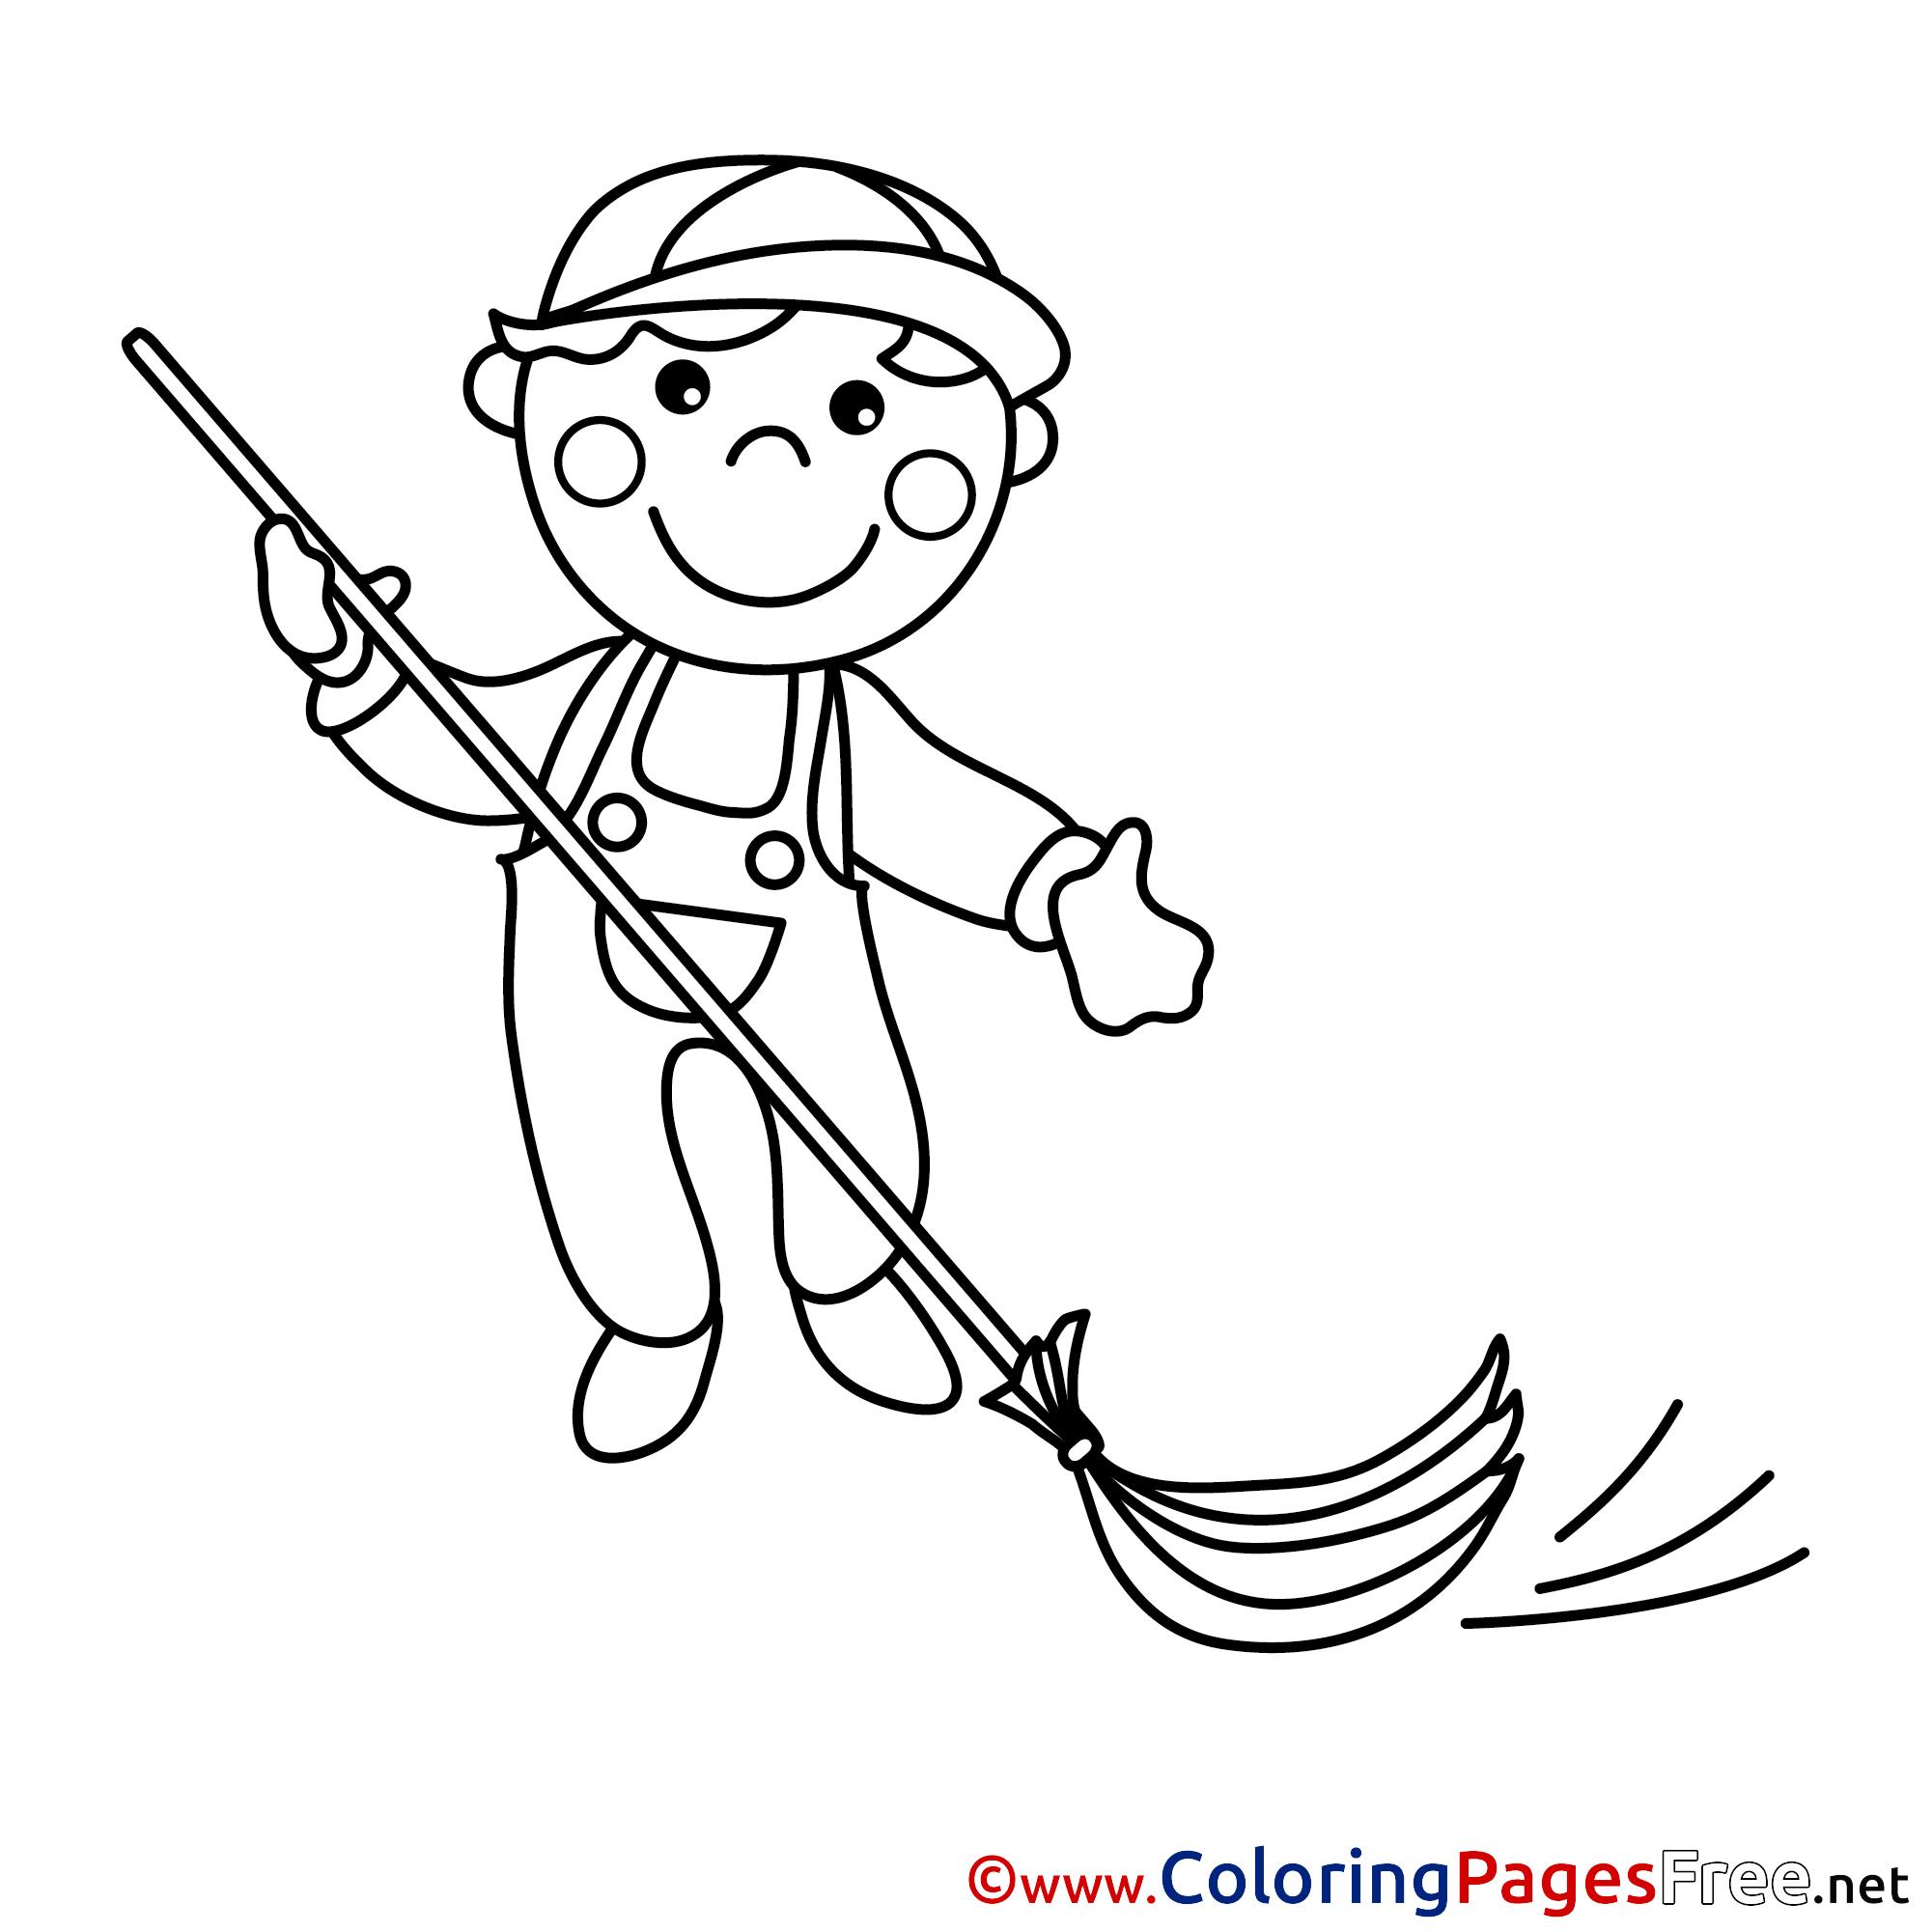 caretaker for kids printable colouring page